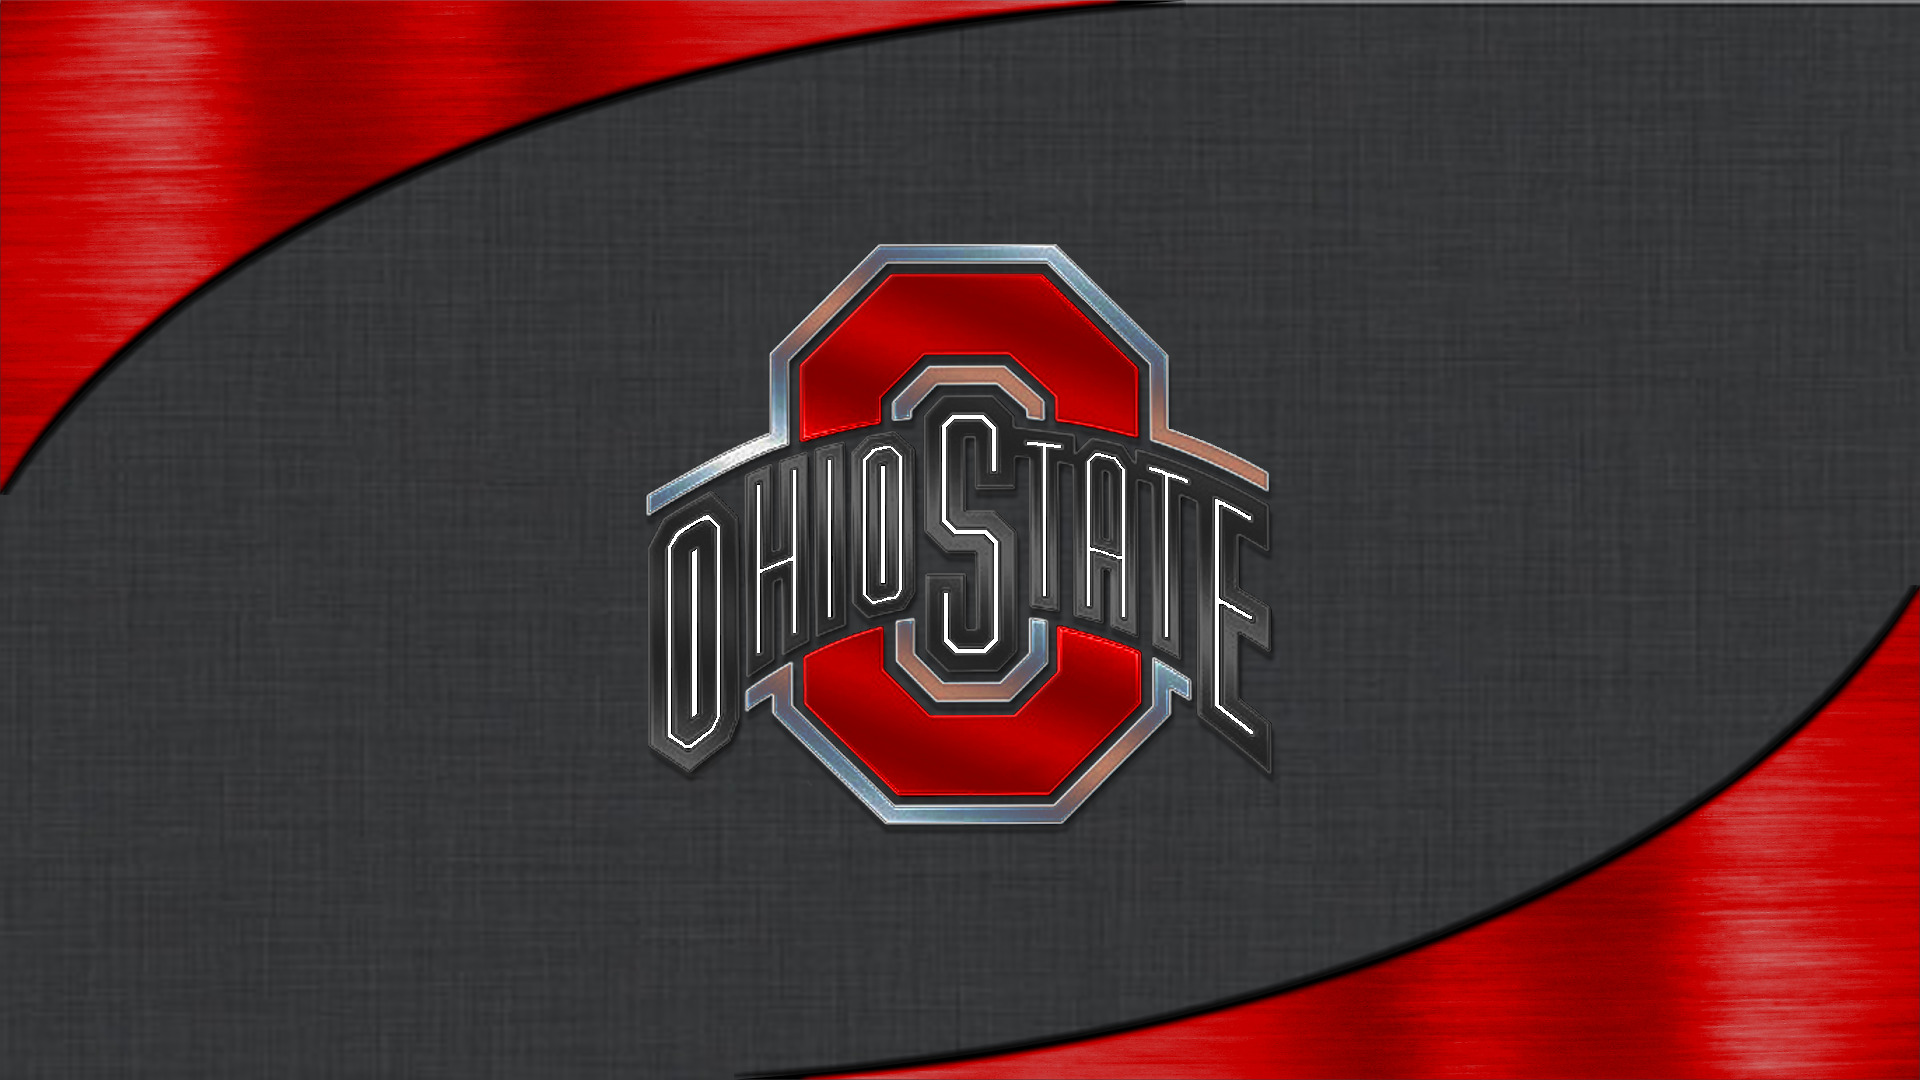 Ohio State Football Screensaver 1920x1080